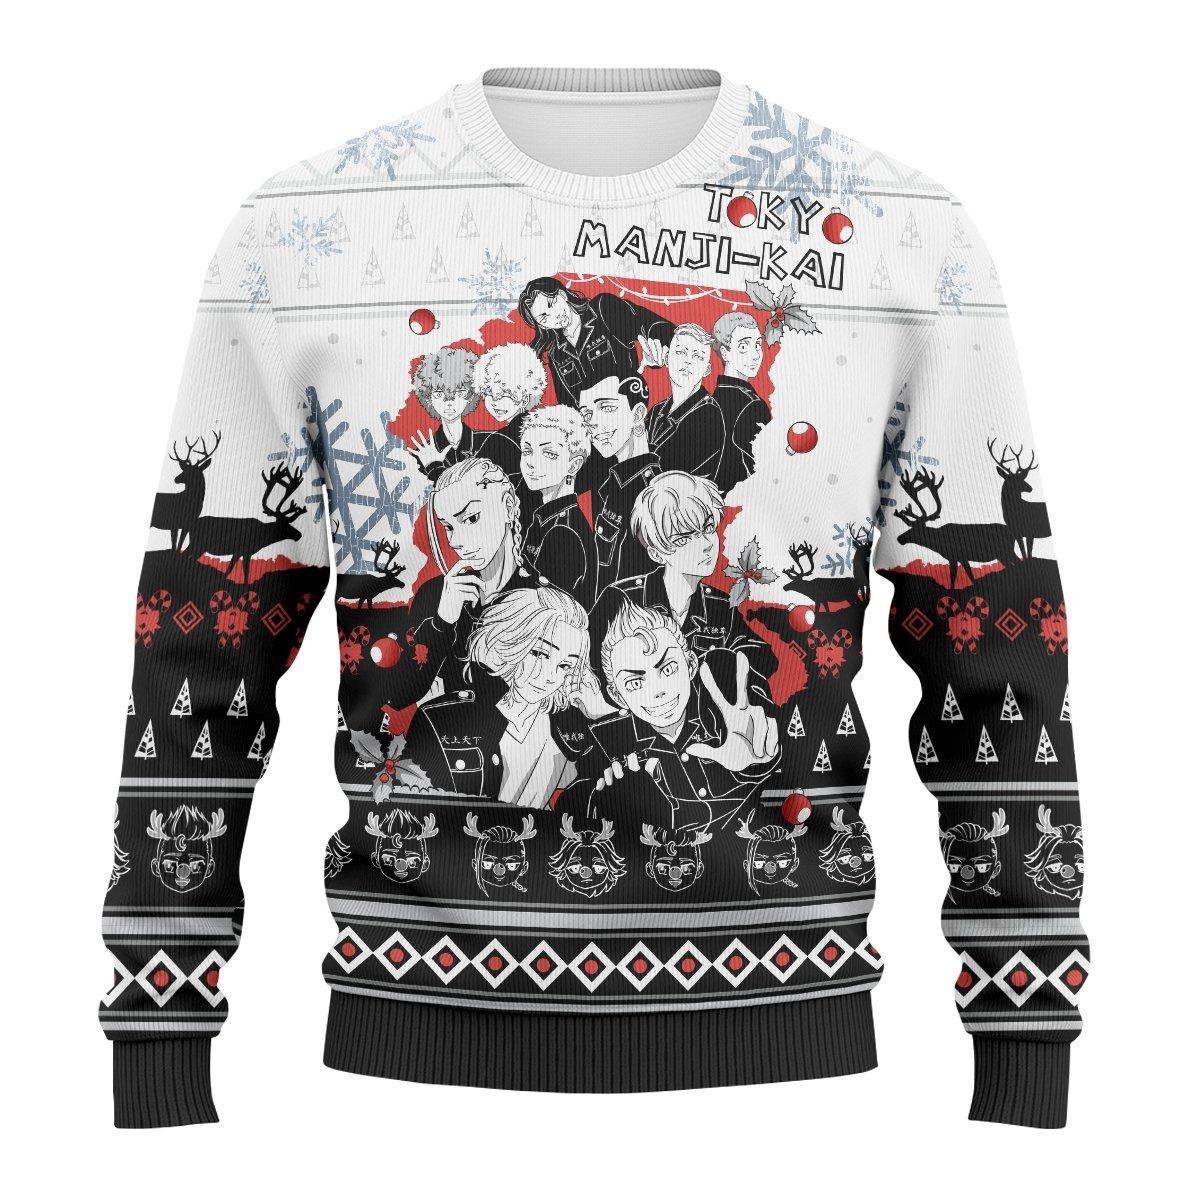 Toman Xmas Unisex Wool Sweater FDM0310 S Official Otaku Treat Merch